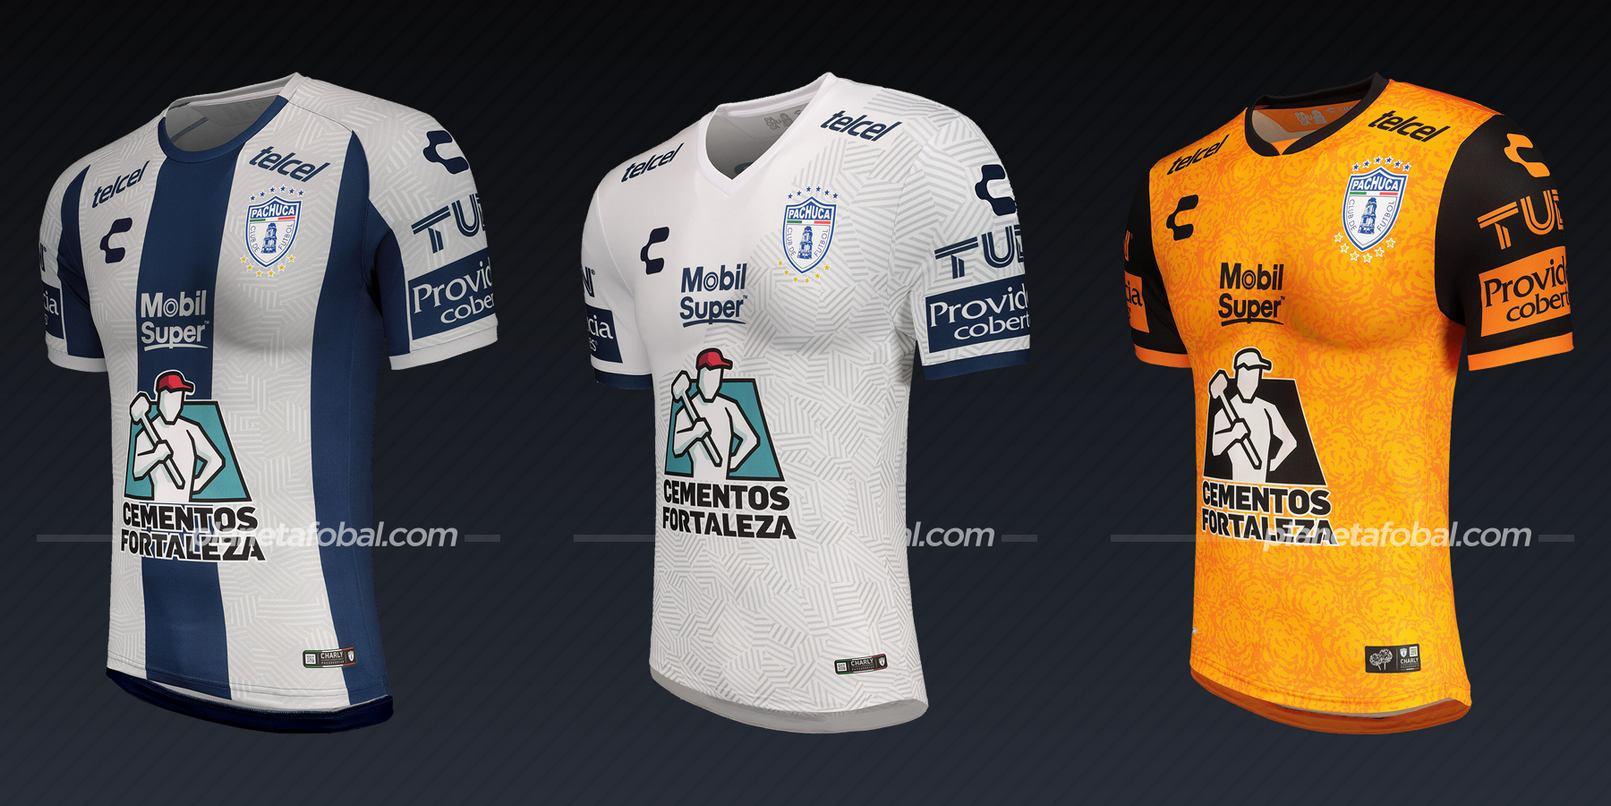 Tuzos del Pachuca (Charly) | Camisetas de la Liga MX 2020/2021